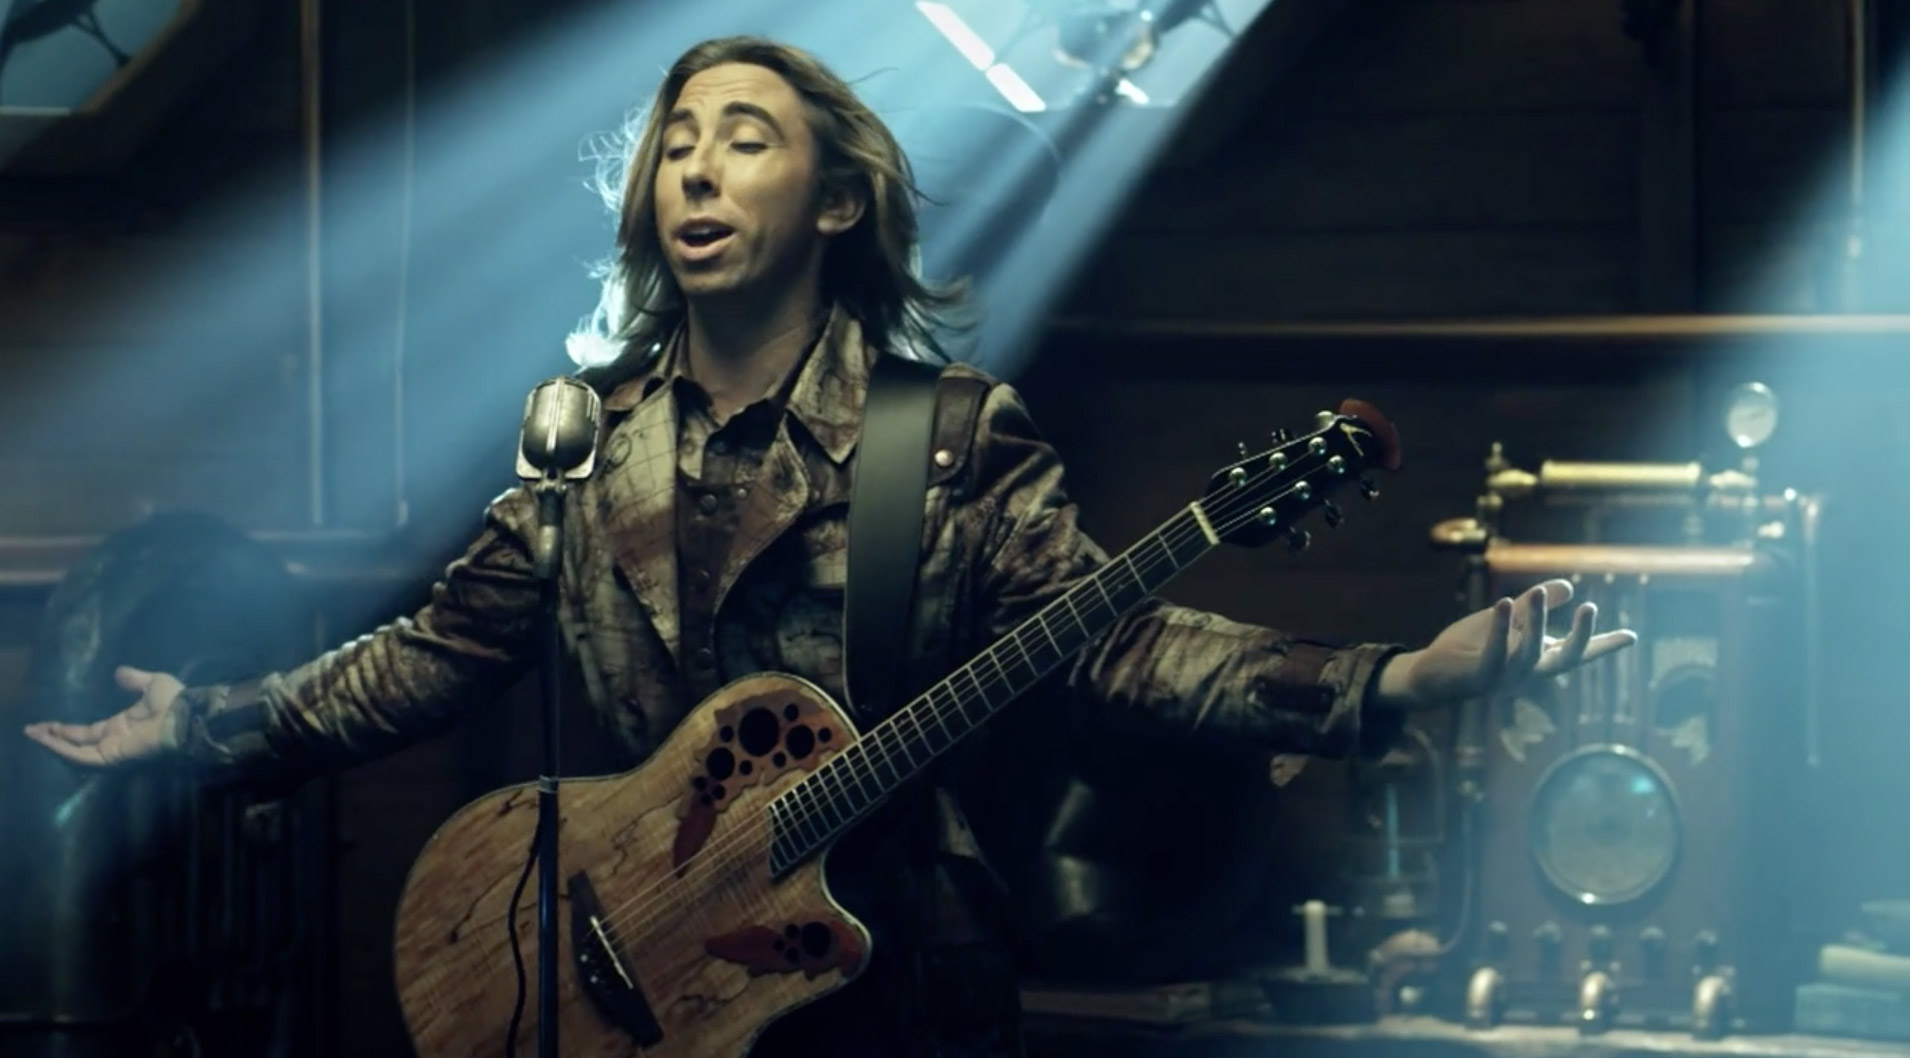 Starboy Music Video